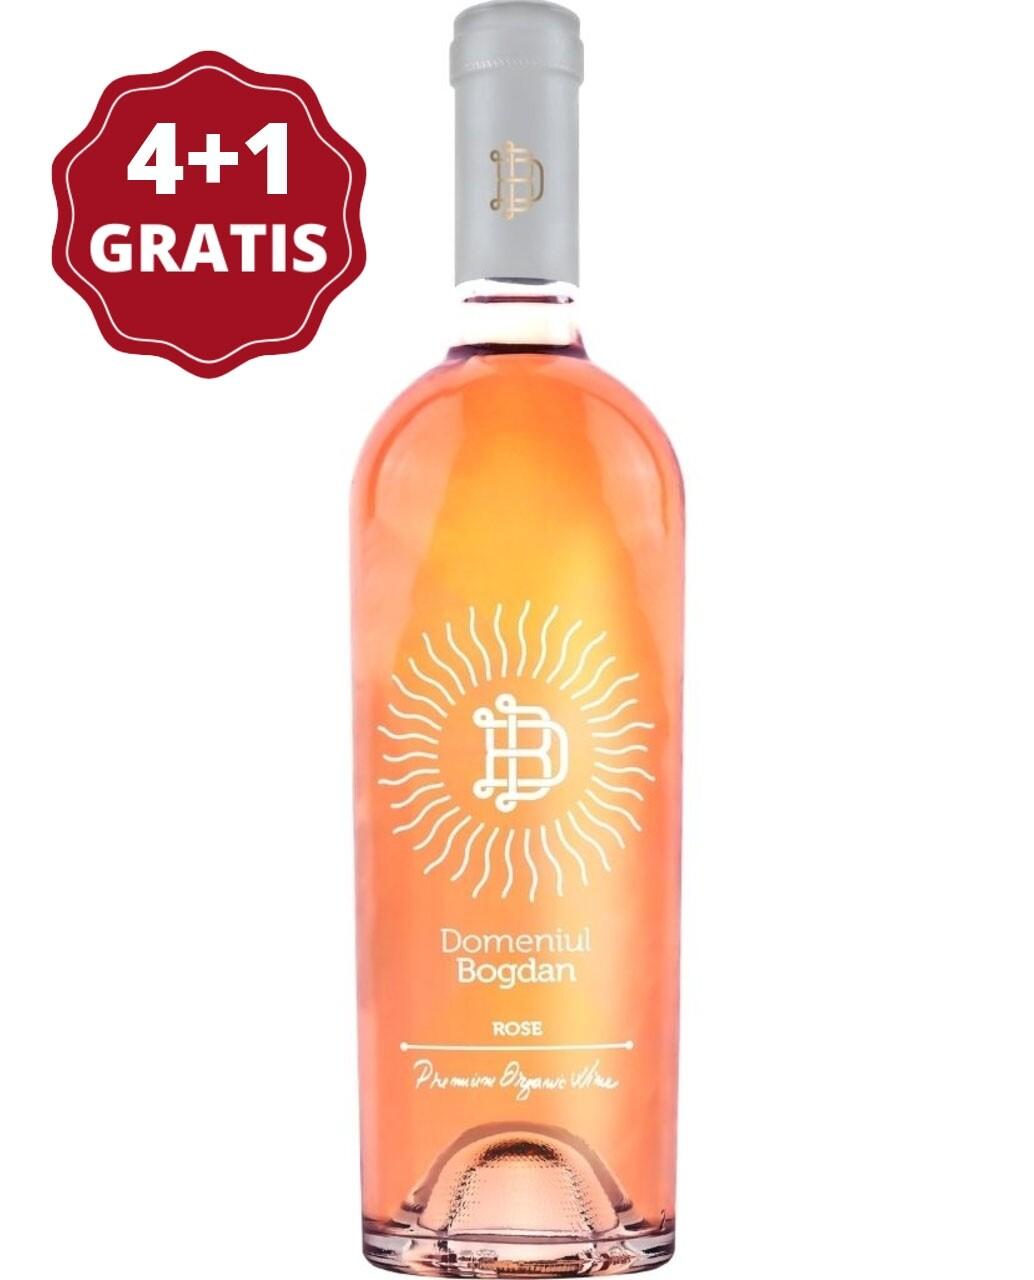 Domeniul Bogdan Premium Rose 4+1